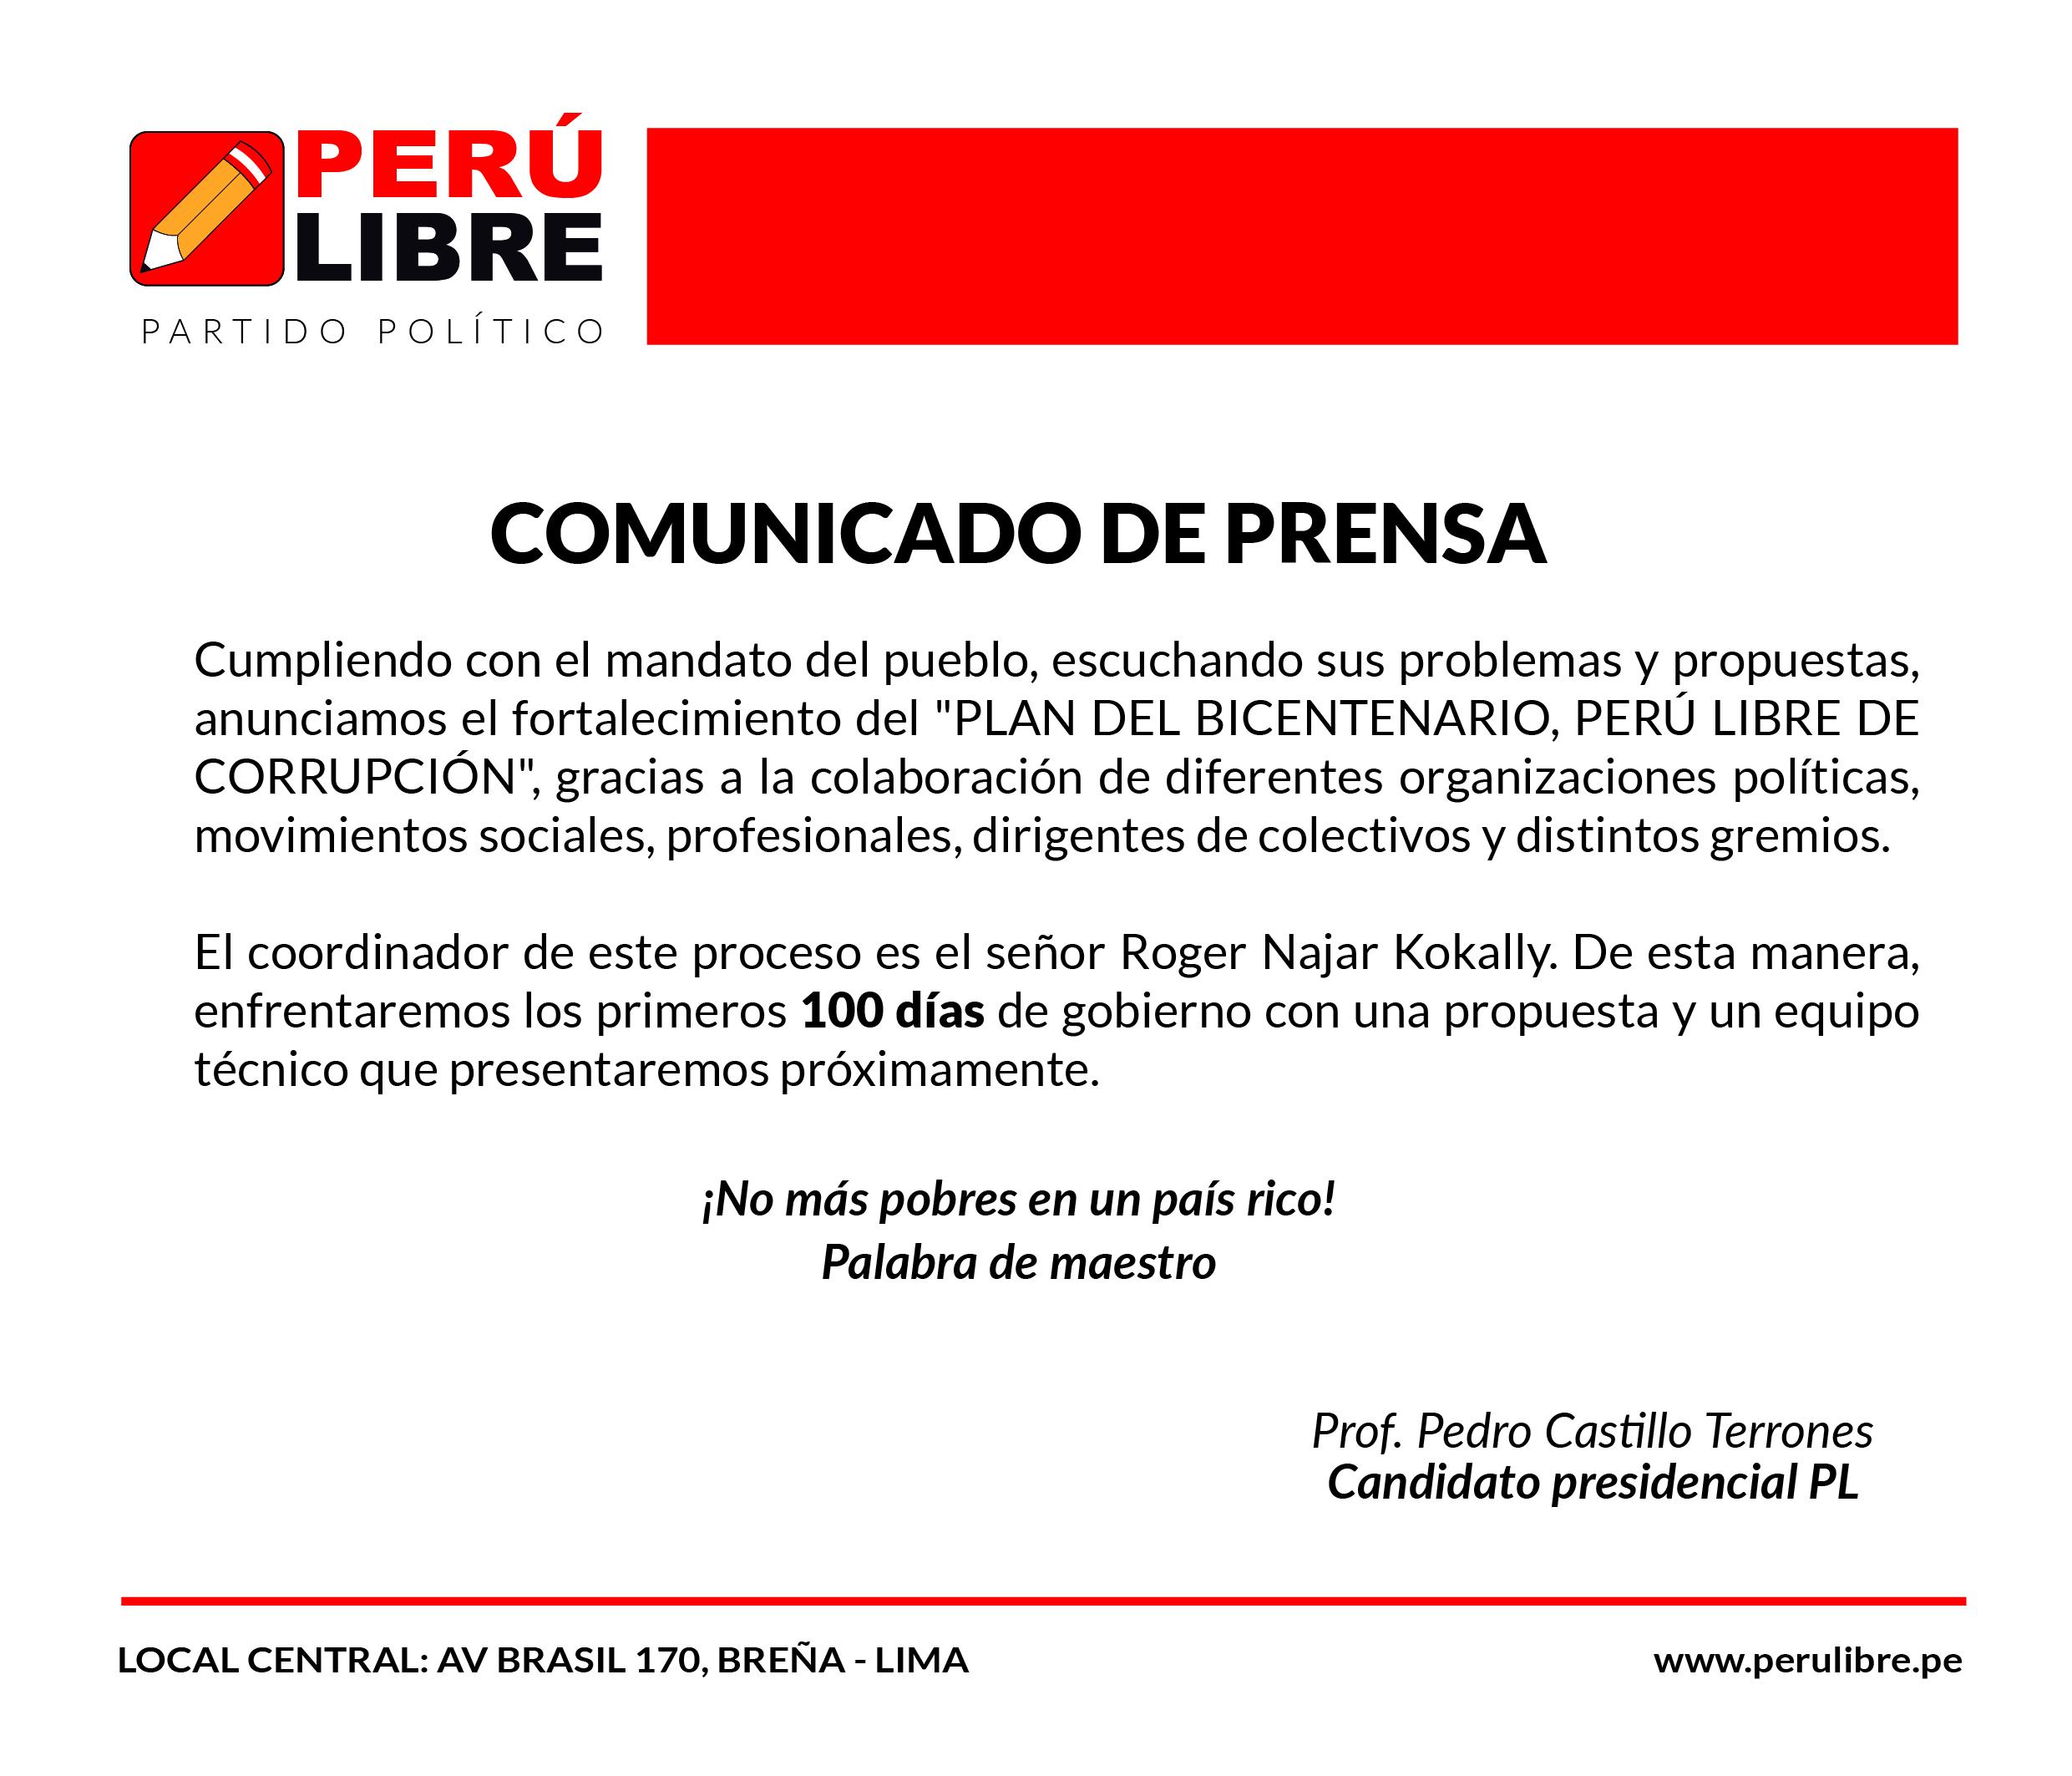 Comunicado de Perú Libre